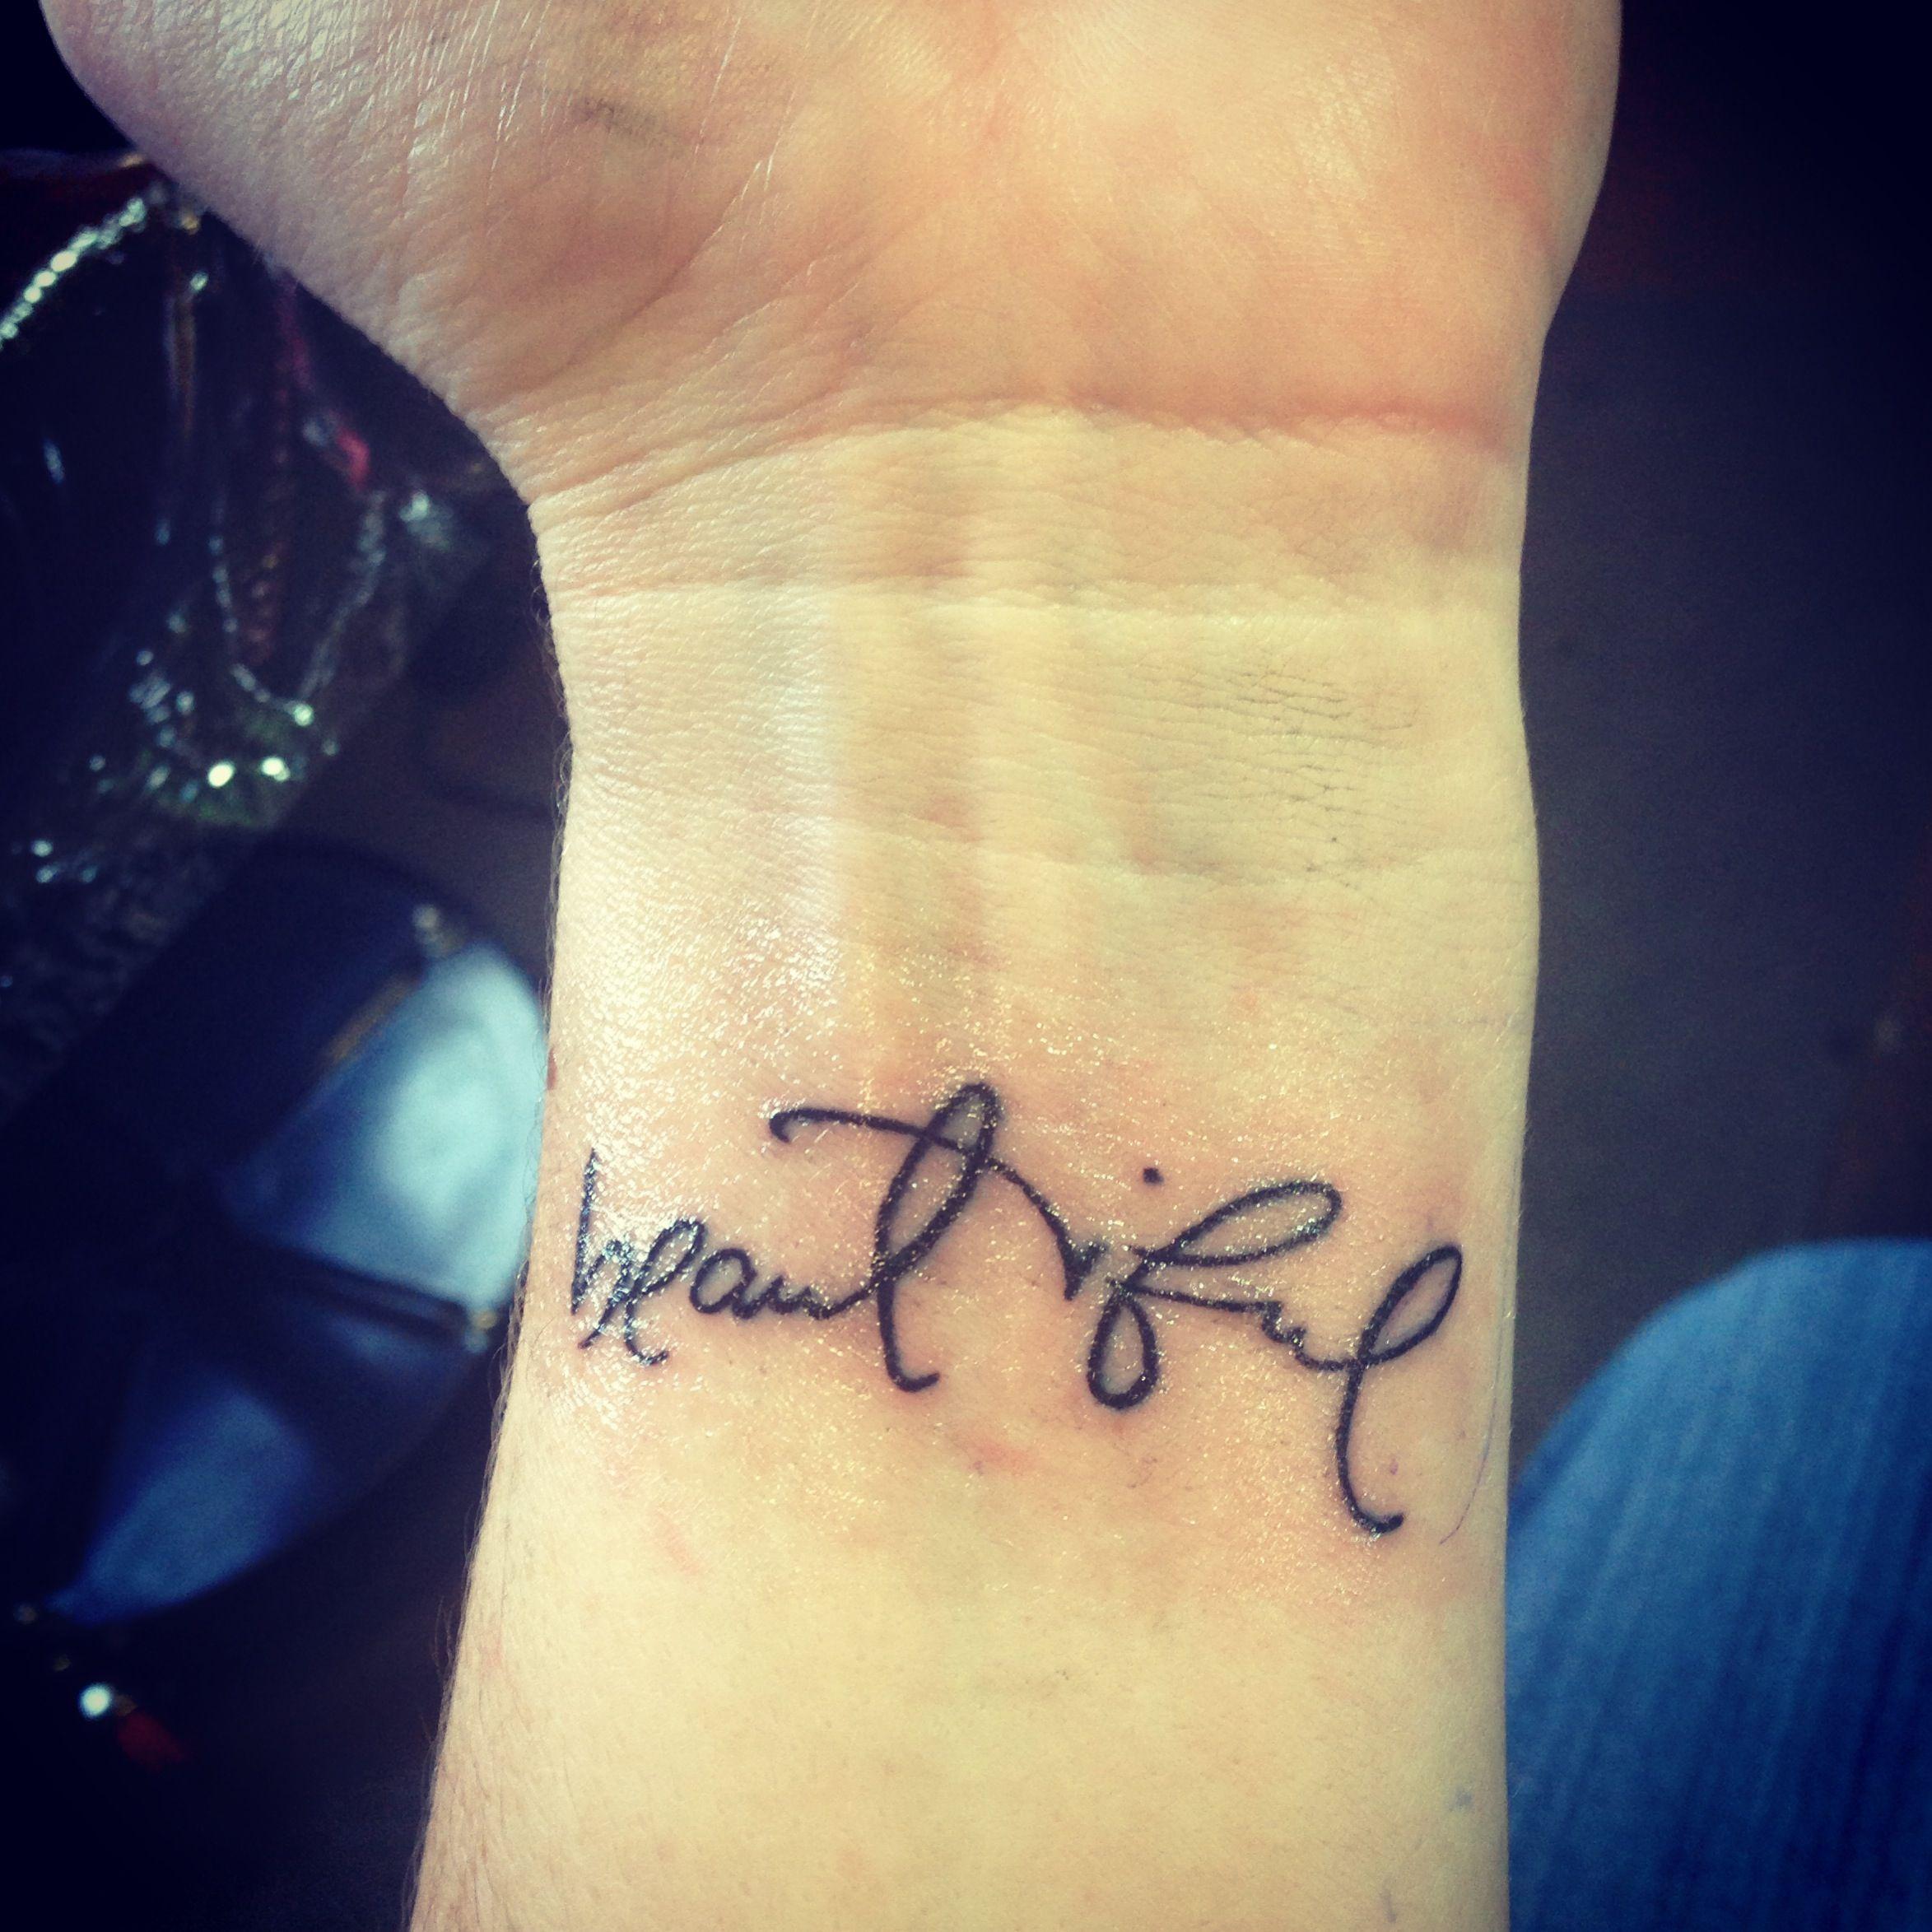 My beautiful wrist tattoo mark at seven seas tattoo in for Body art tattoos lincoln